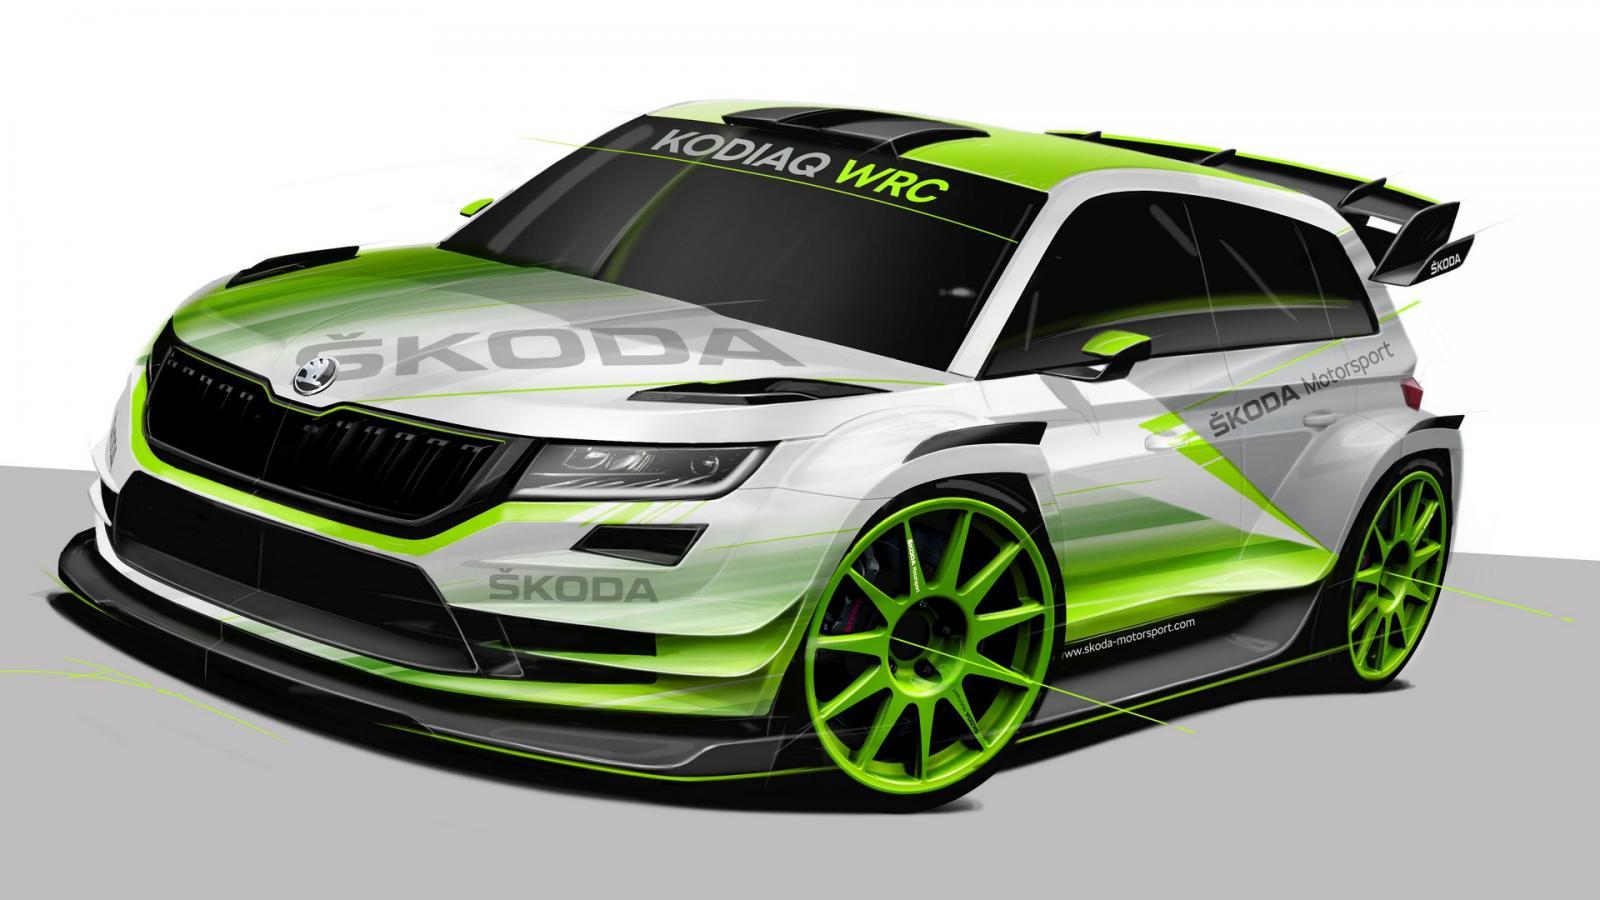 Skoda представила новые фото внедорожника Kodiaq WRC 2018